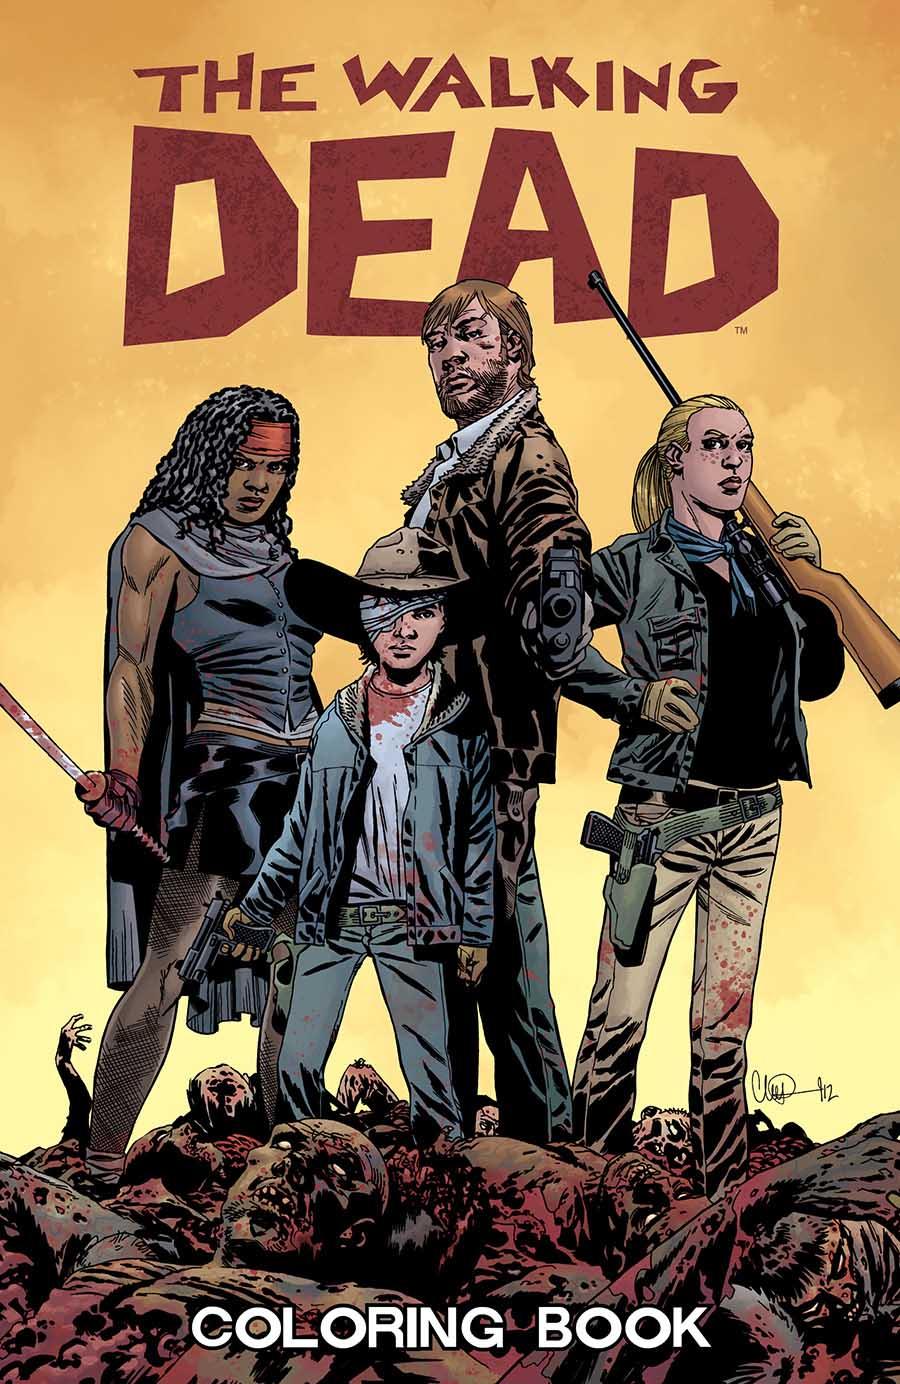 Walking Dead Adult Coloring Book